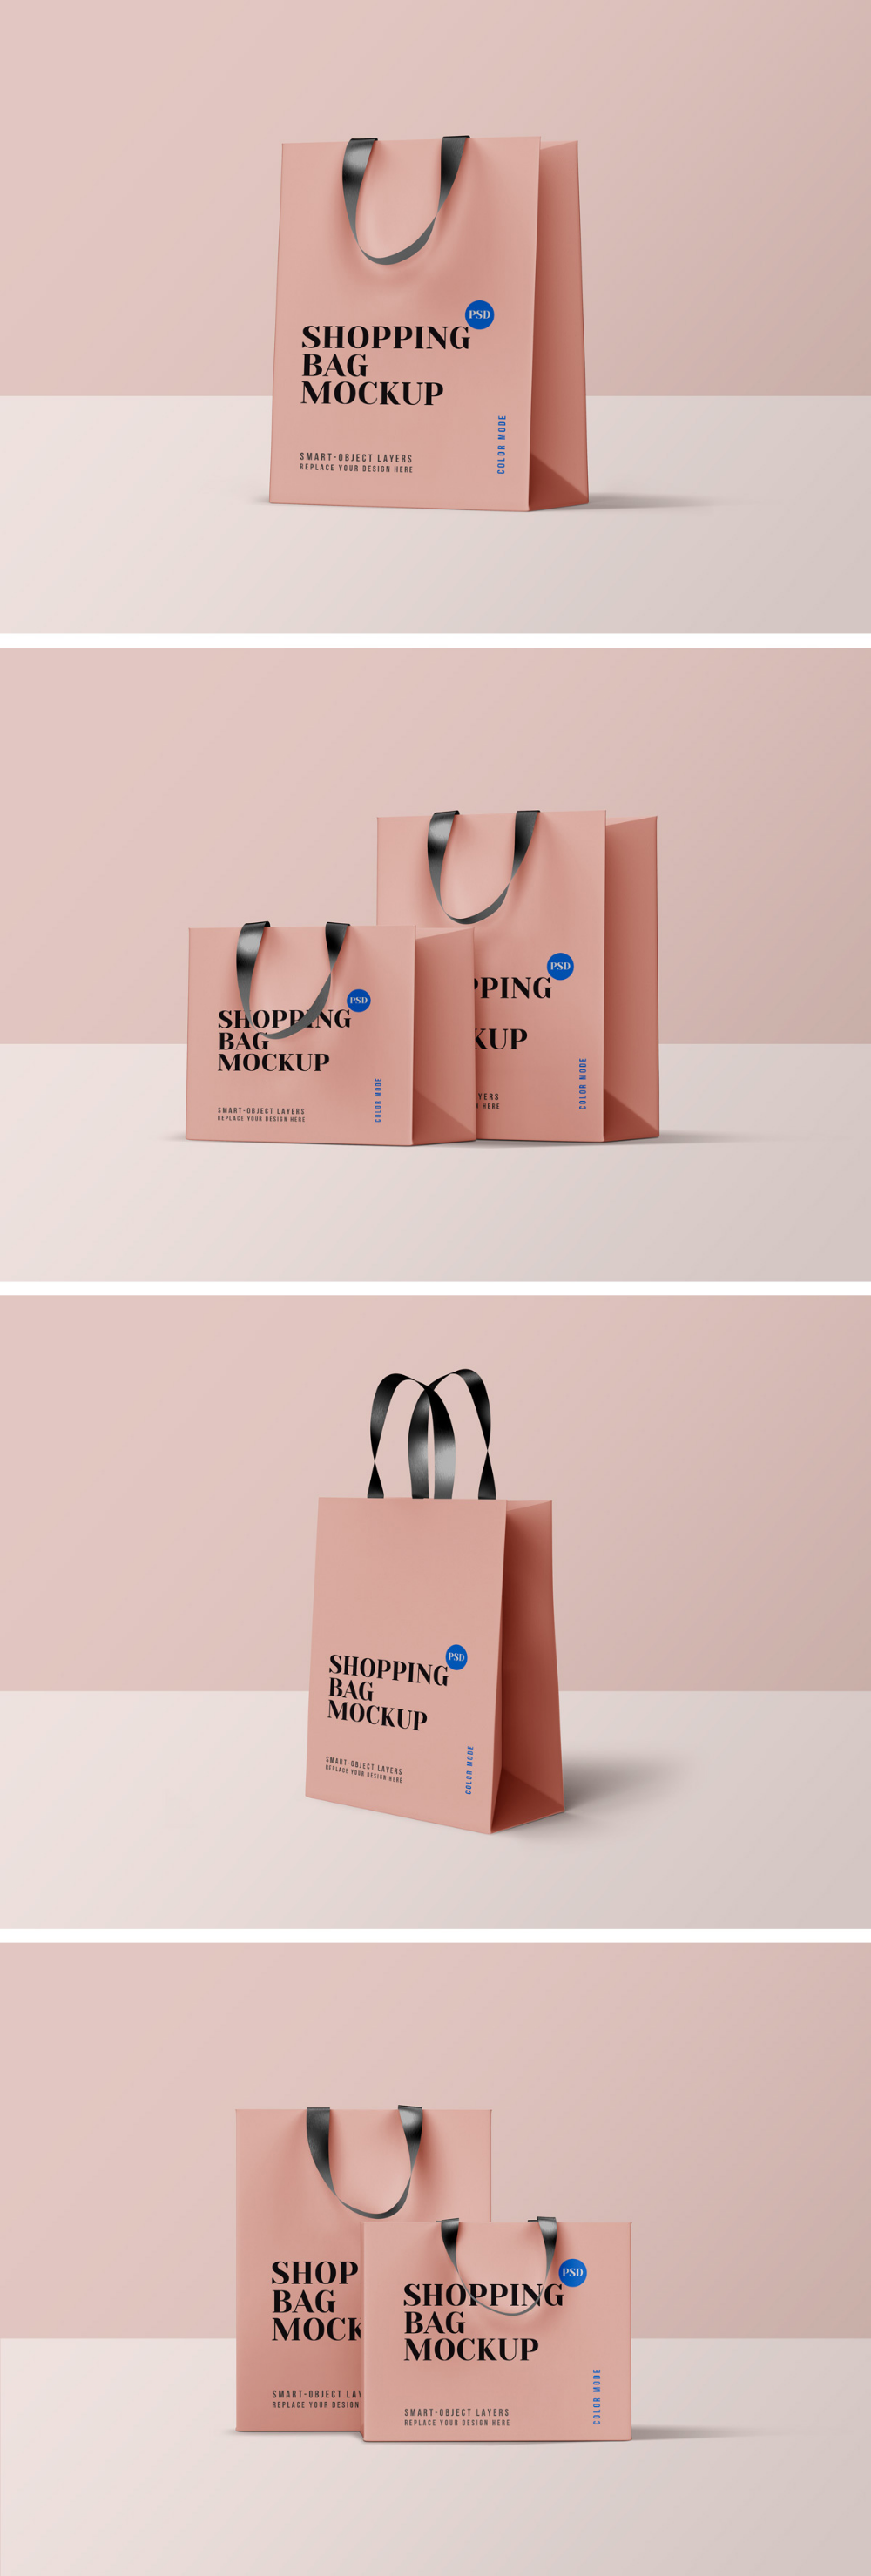 Download Shopping Bag Psd Mockups Vol 1 Graphicsfuel Bag Mockup Mockup Psd Mockup